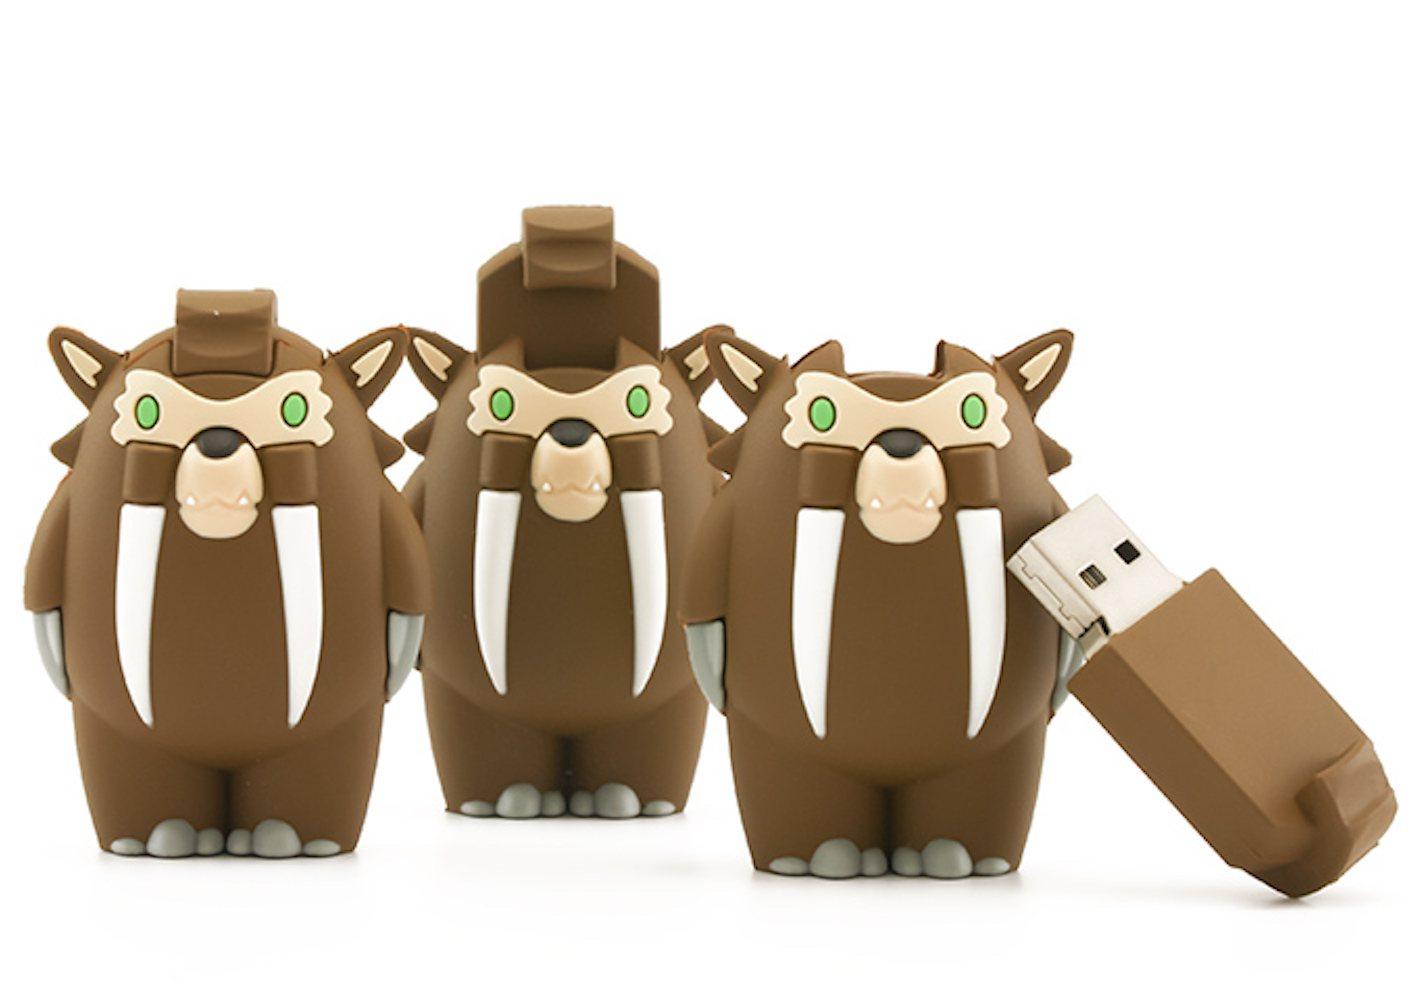 3D Custom Shaped USB Drives